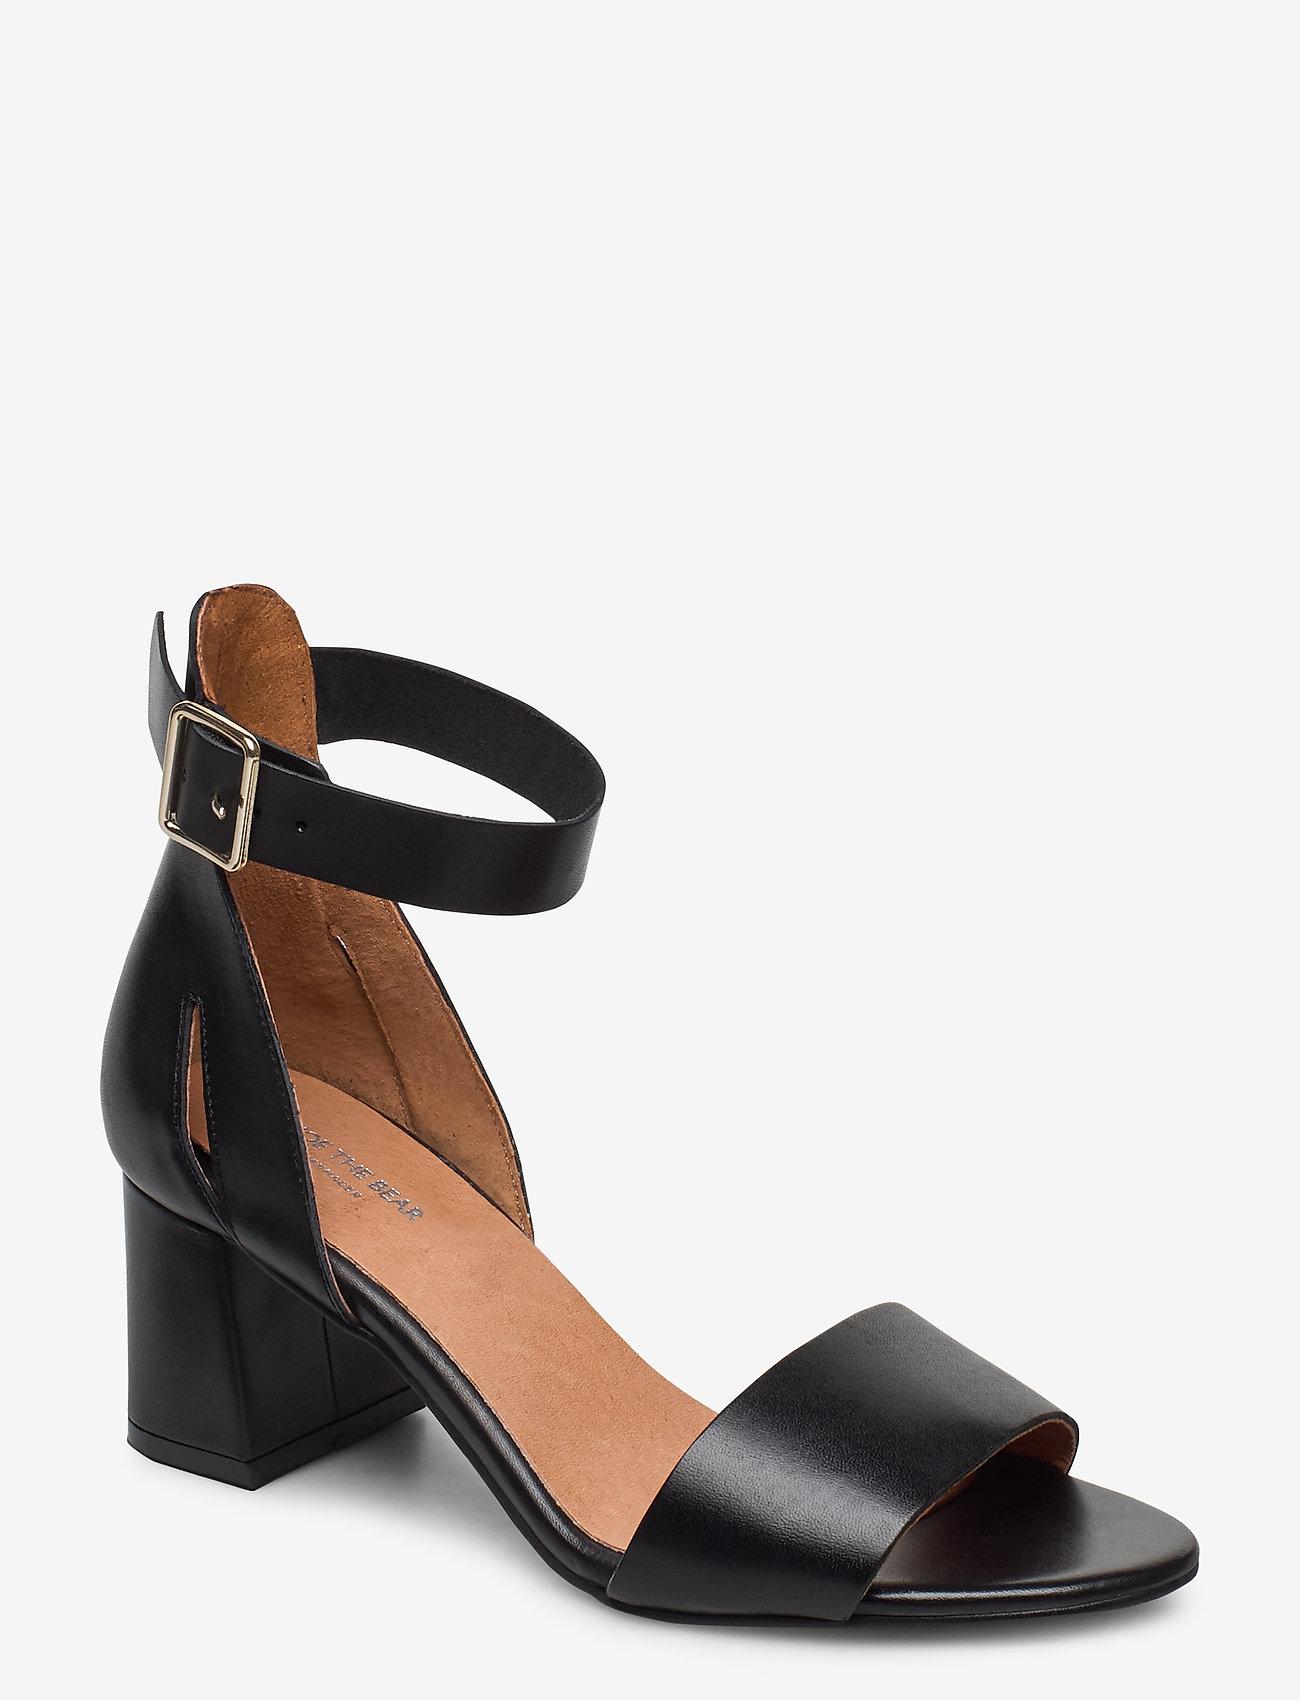 Stb-may L (Black) - Shoe The Bear vseM33